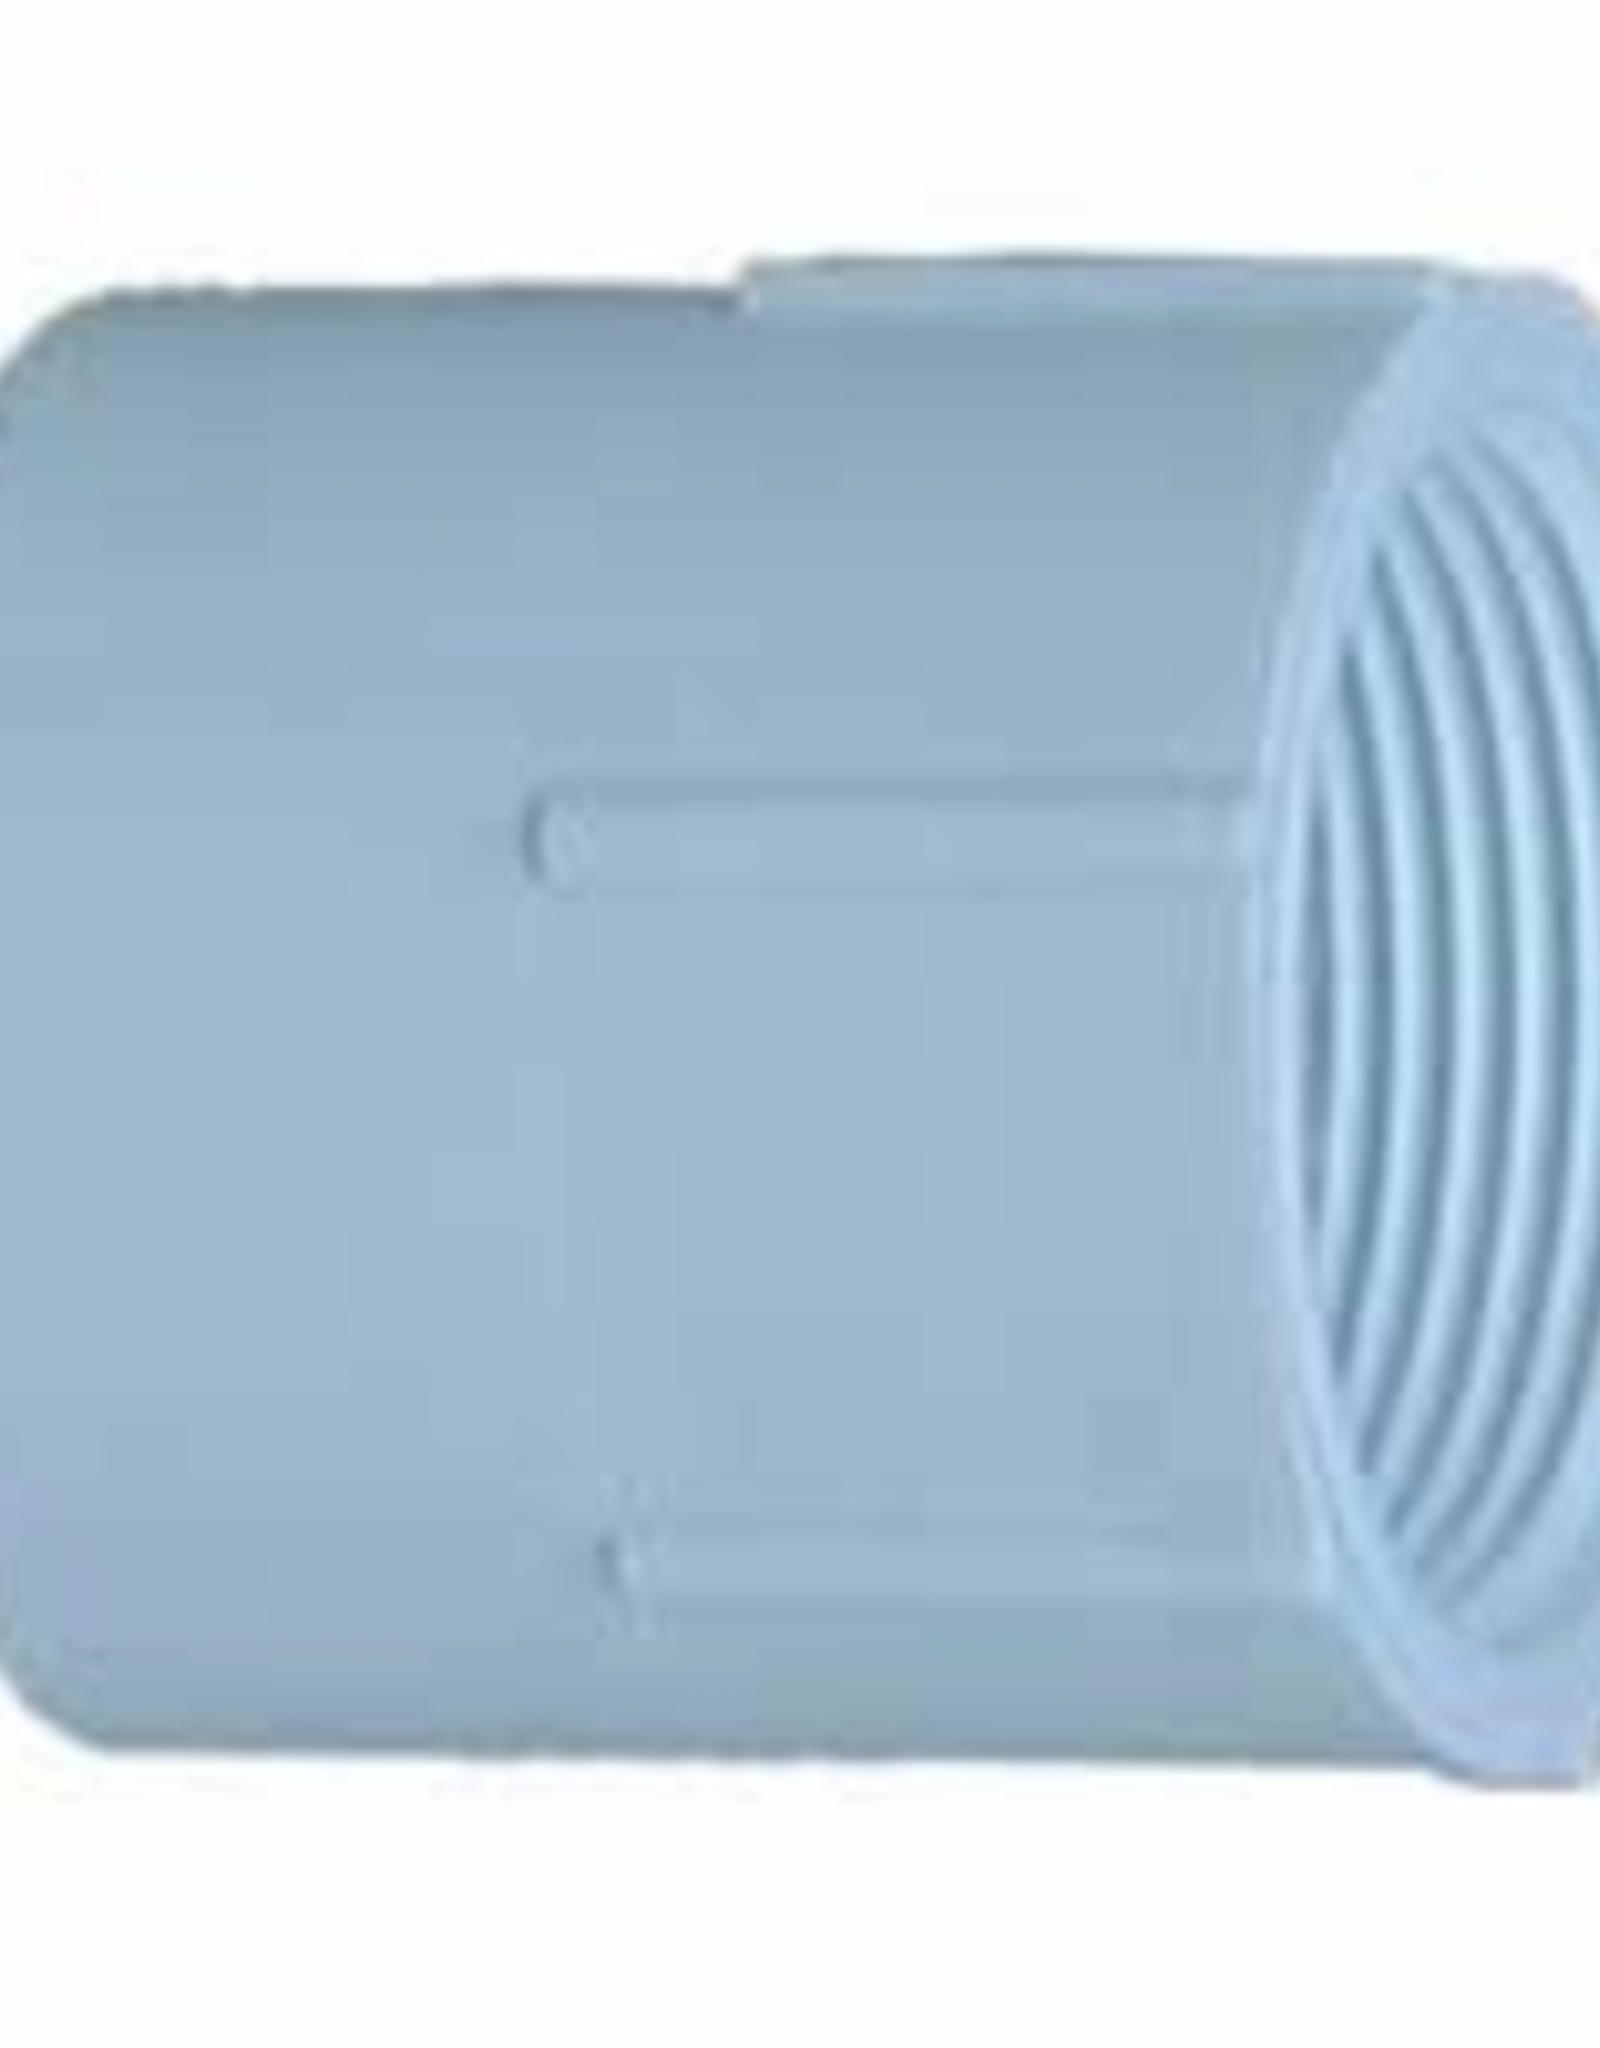 "Lasco Fittings PVC 1"" Female Adapter Slip x FPT"